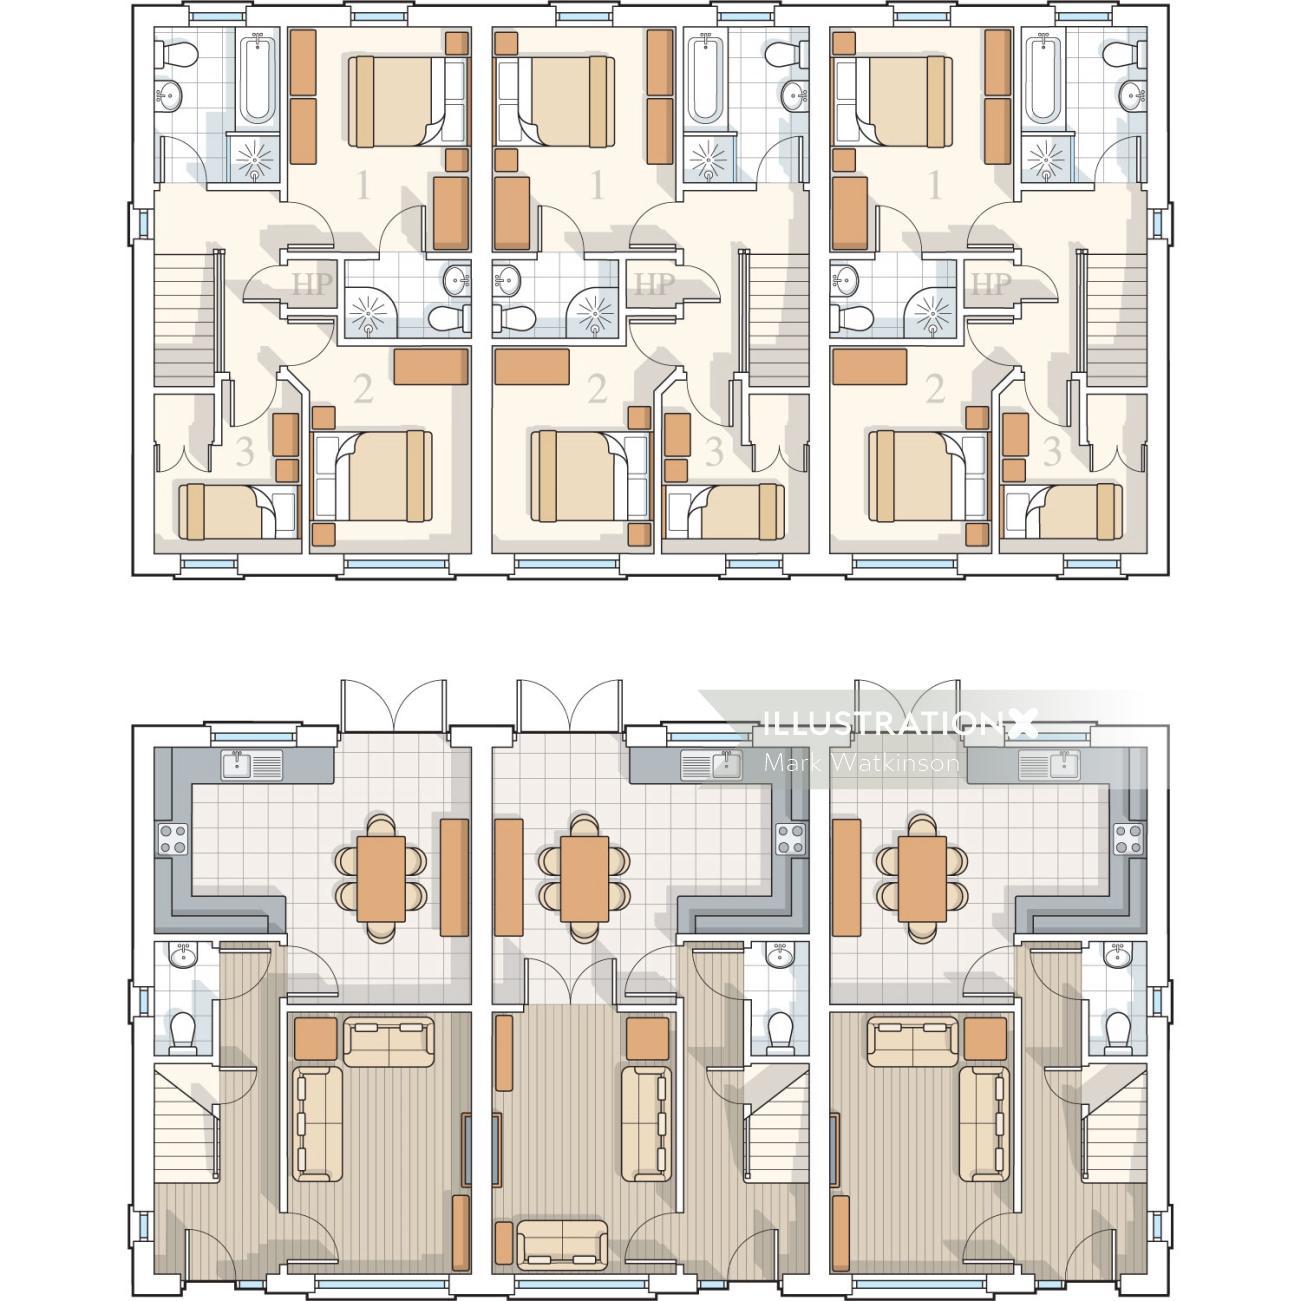 Building planing illustration by Mark Watkinson